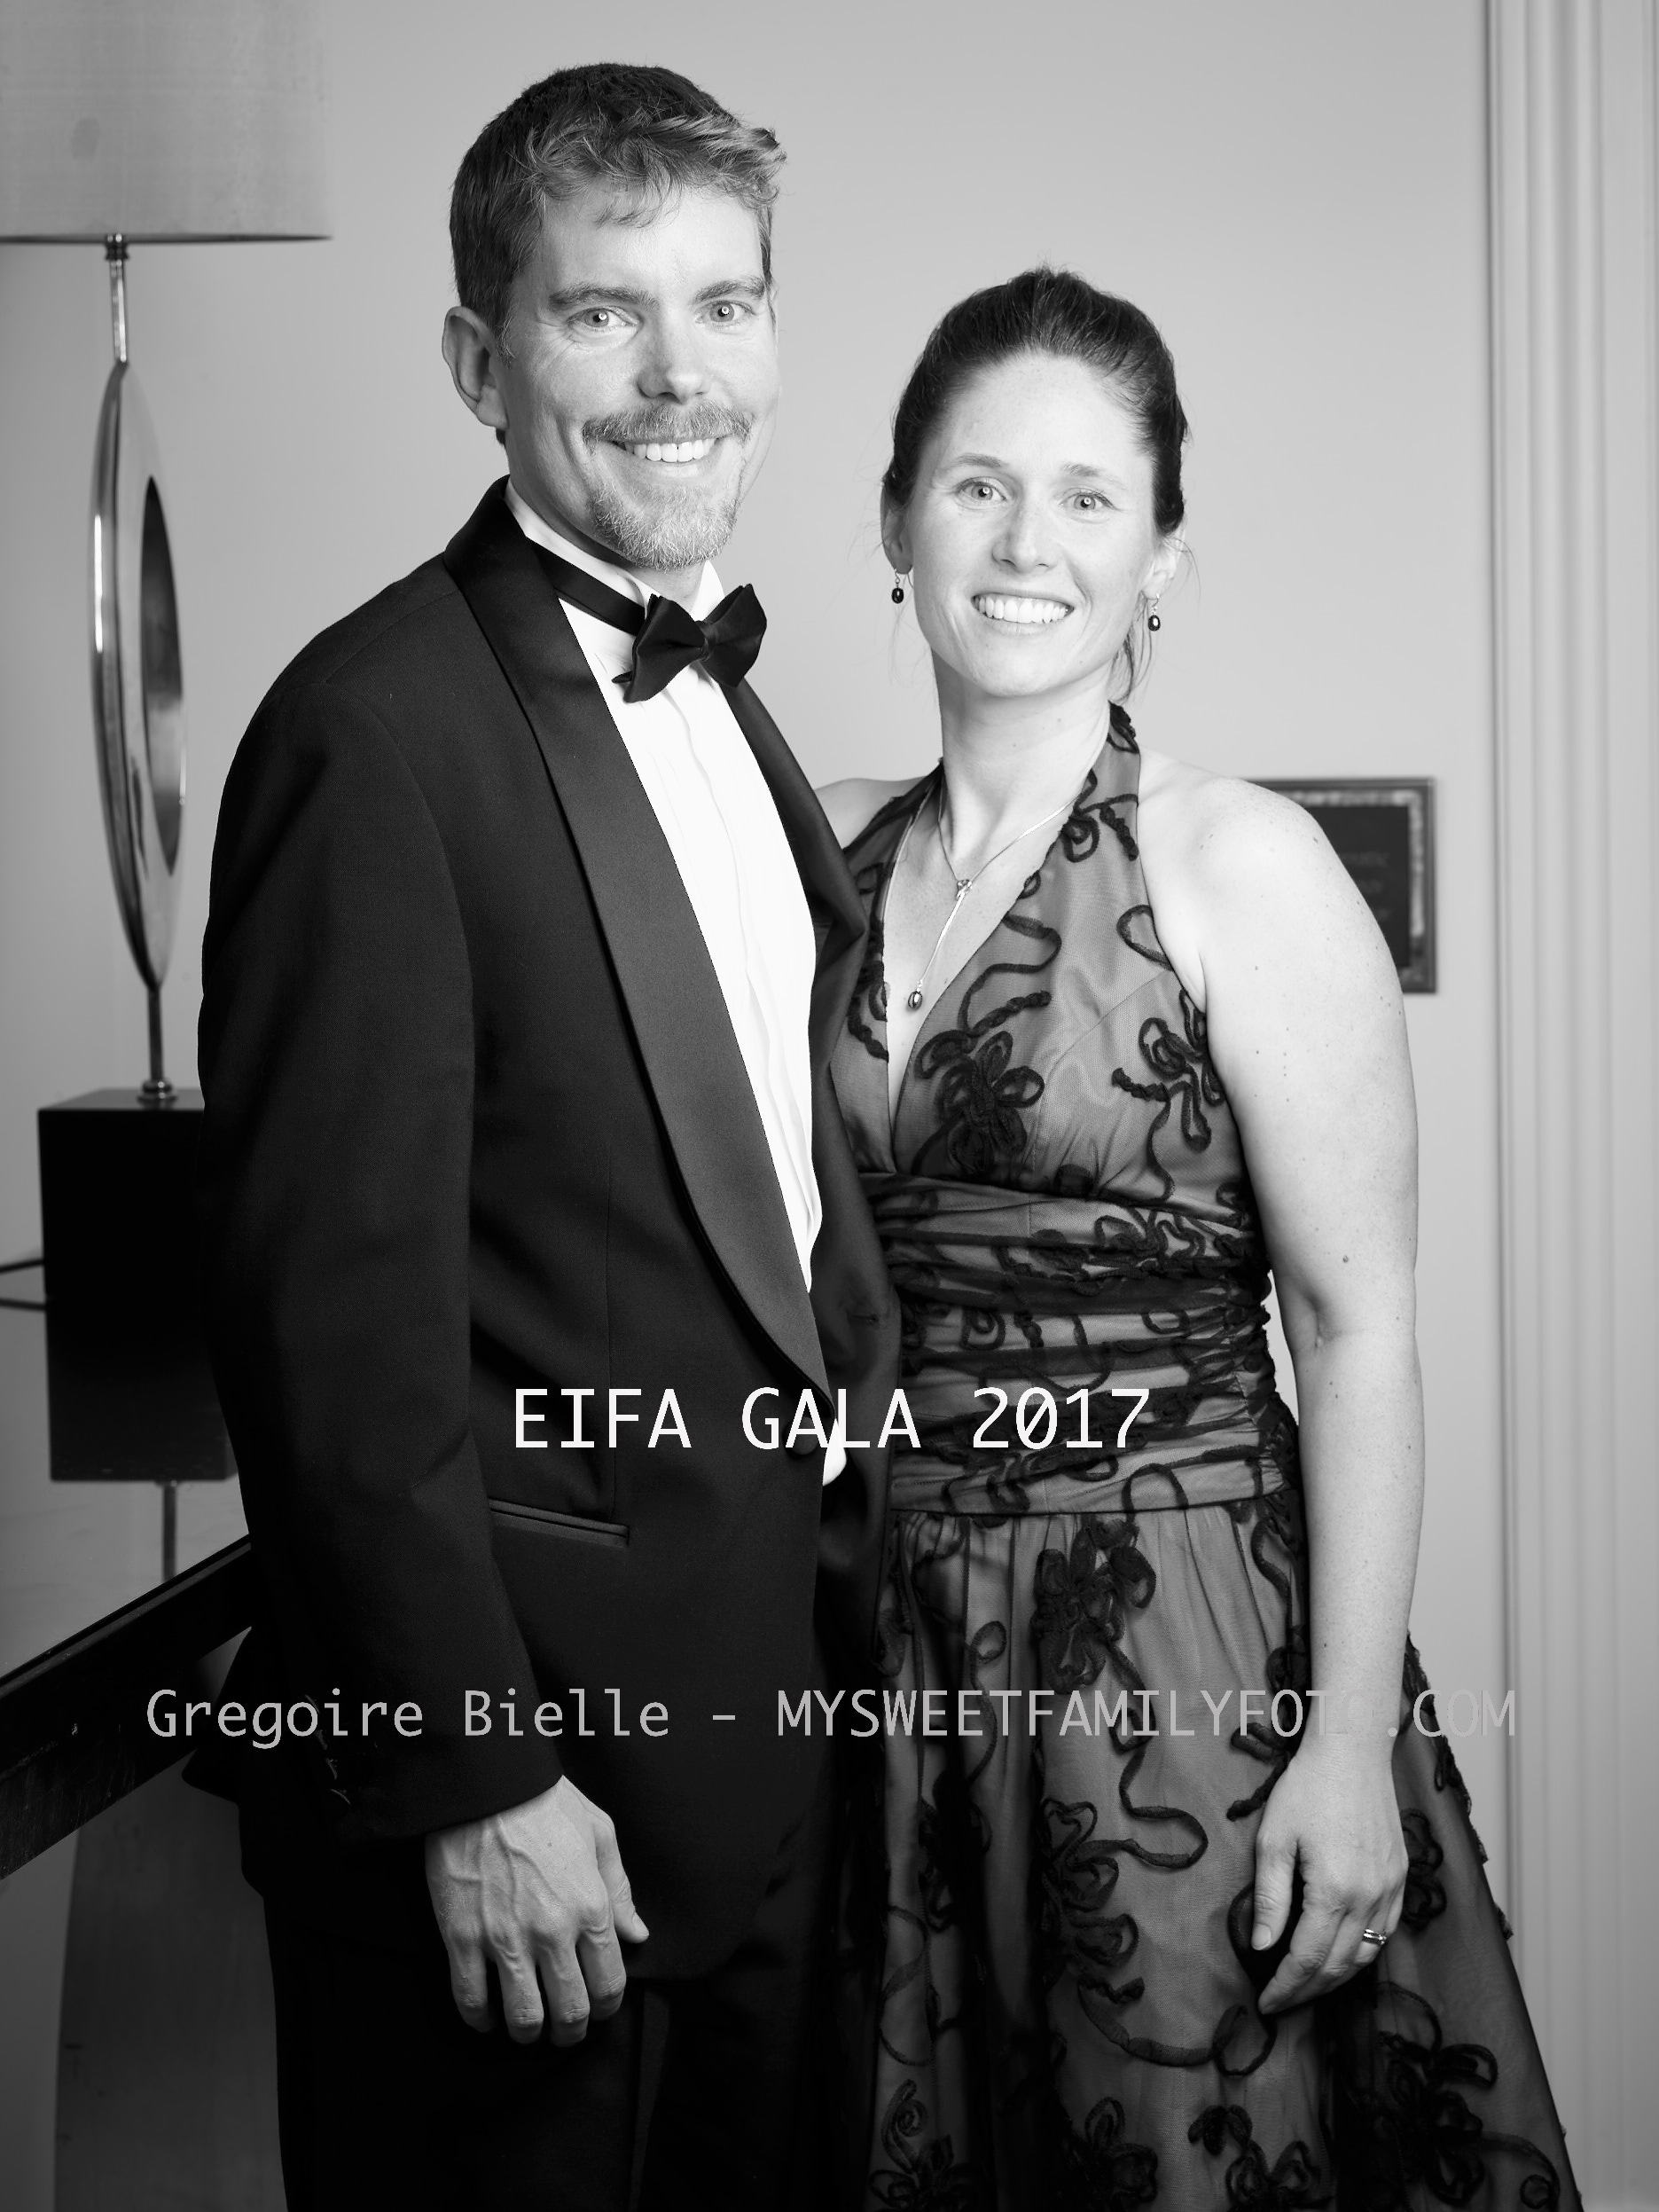 EIFA GALA 1198.jpg